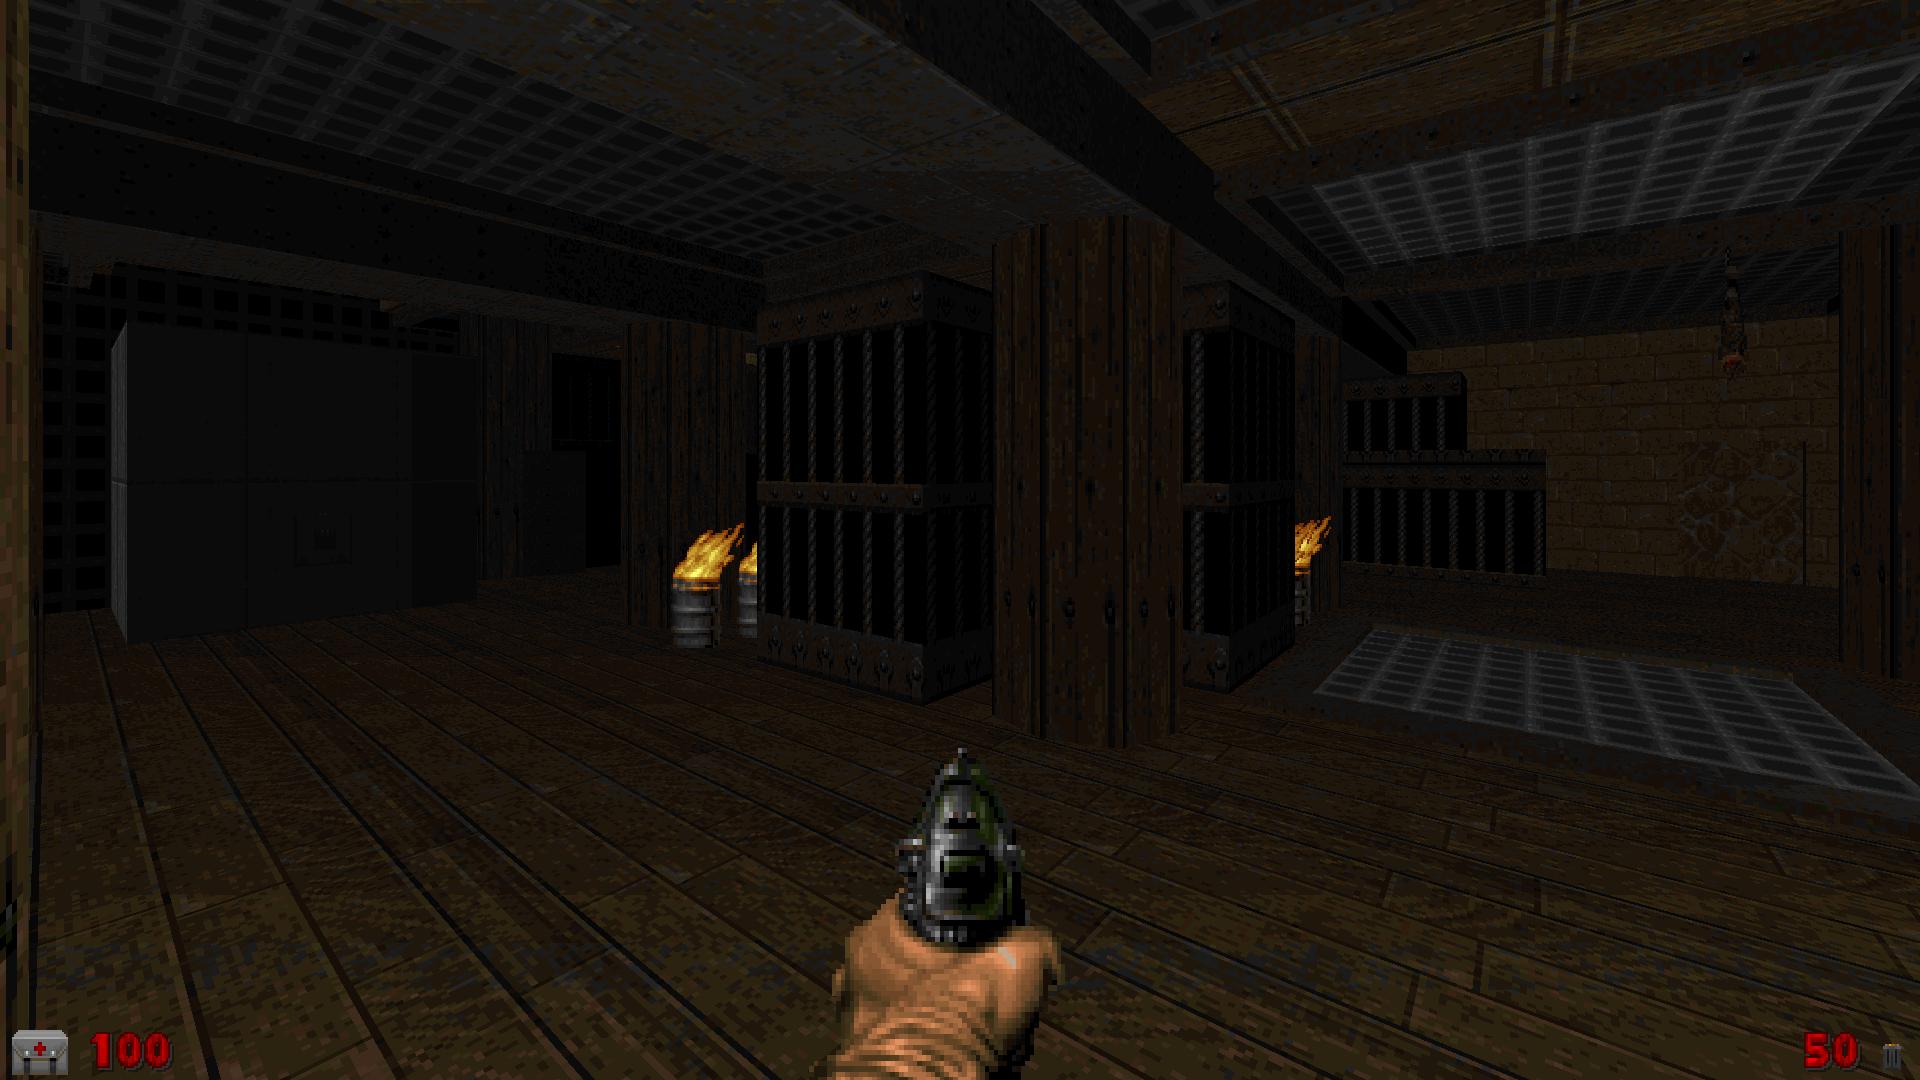 Screenshot_Doom_20200330_190114.png.9e1c780d89c3162908b201beac54f4ee.png